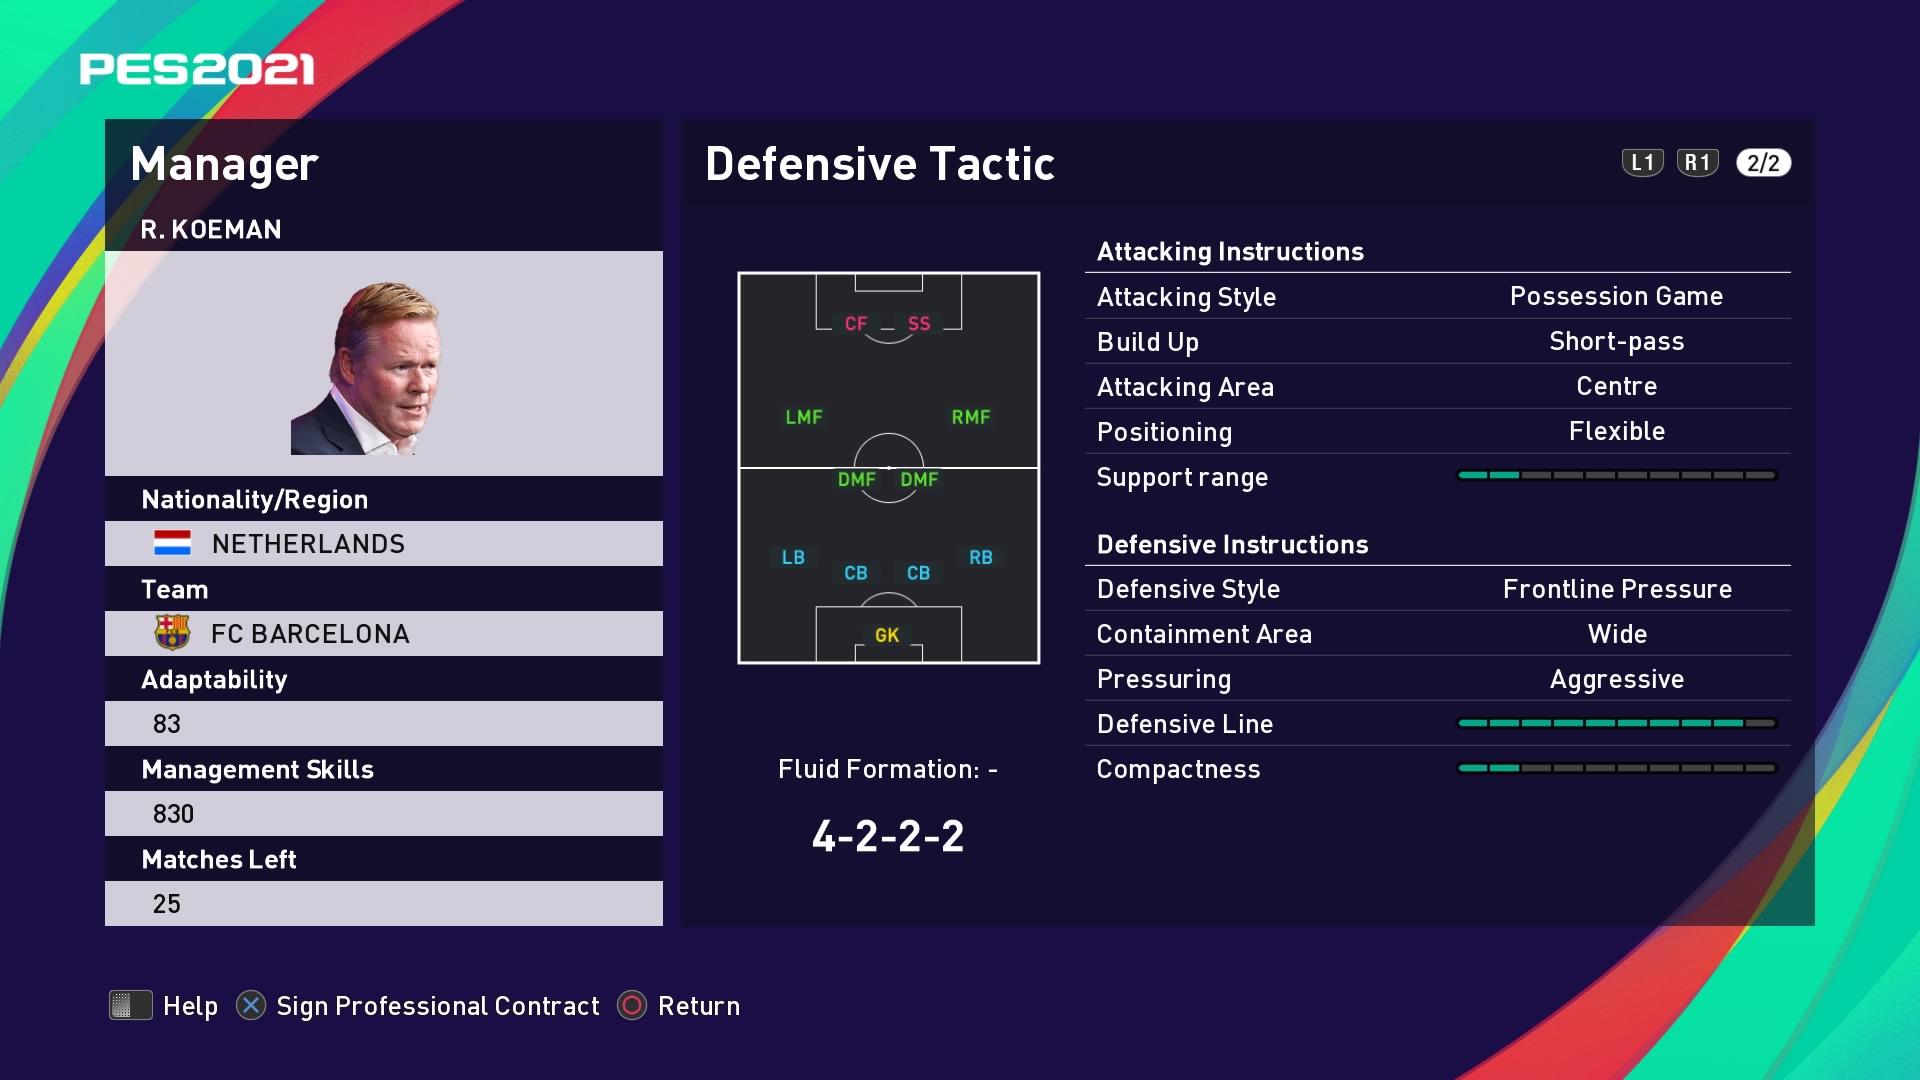 R. Koeman (2) (Ronald Koeman) Defensive Tactic in PES 2021 myClub